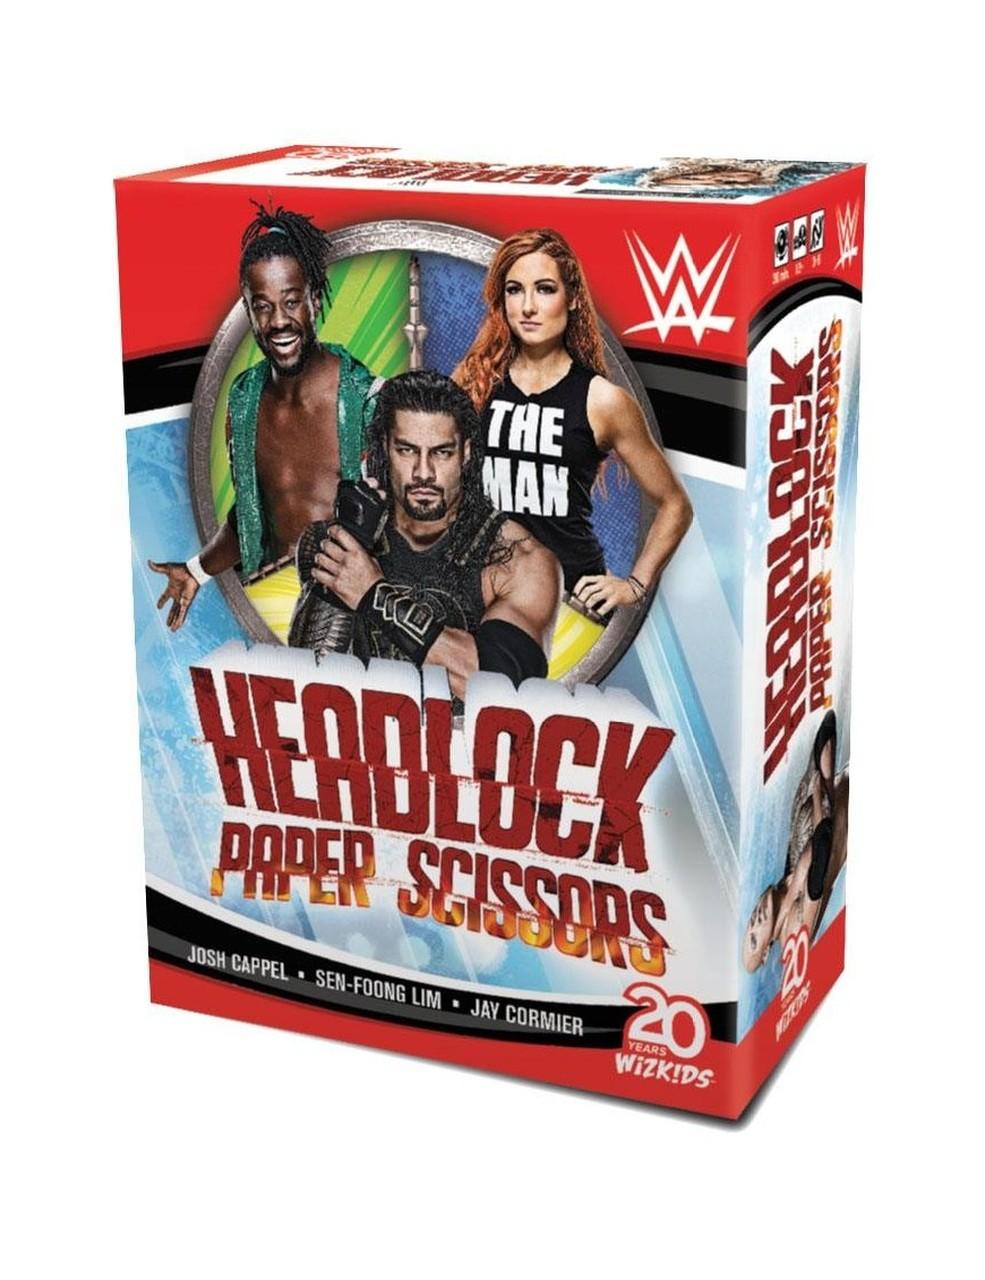 WWE - Headlock Paper Scissors